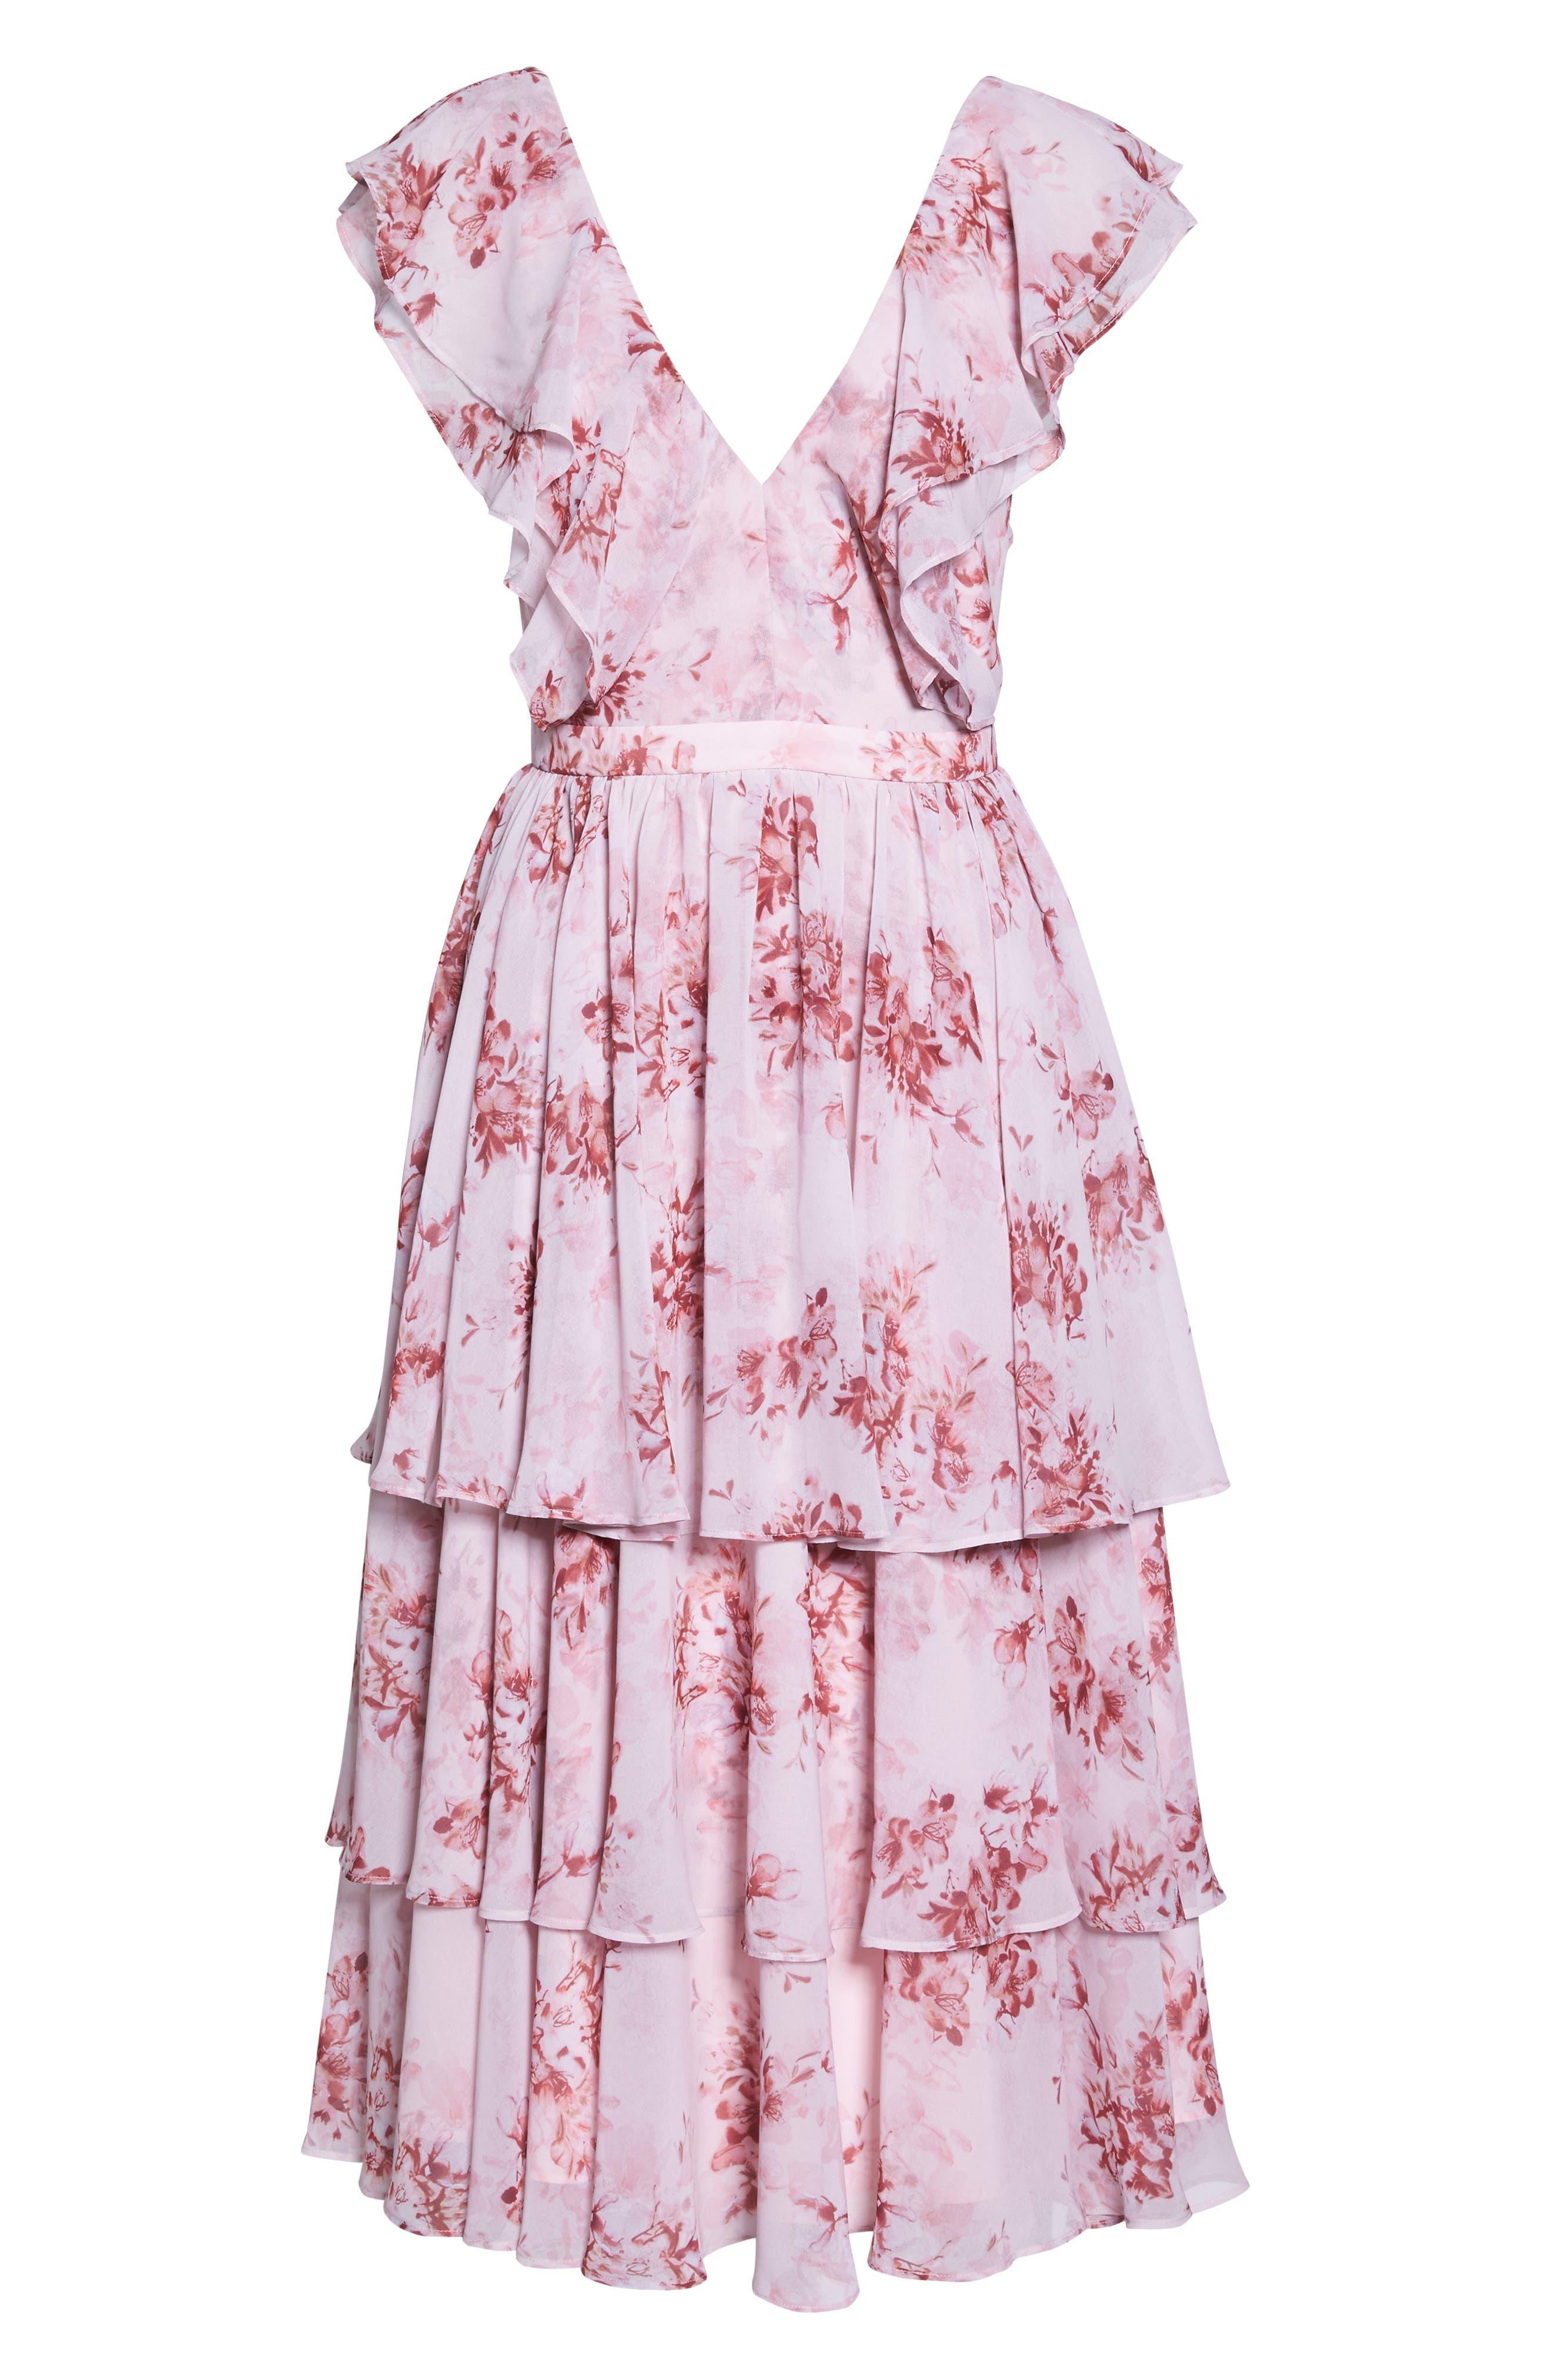 Edy Floral Georgette Dress,                             Alternate thumbnail 6, color,                             Delaney Print